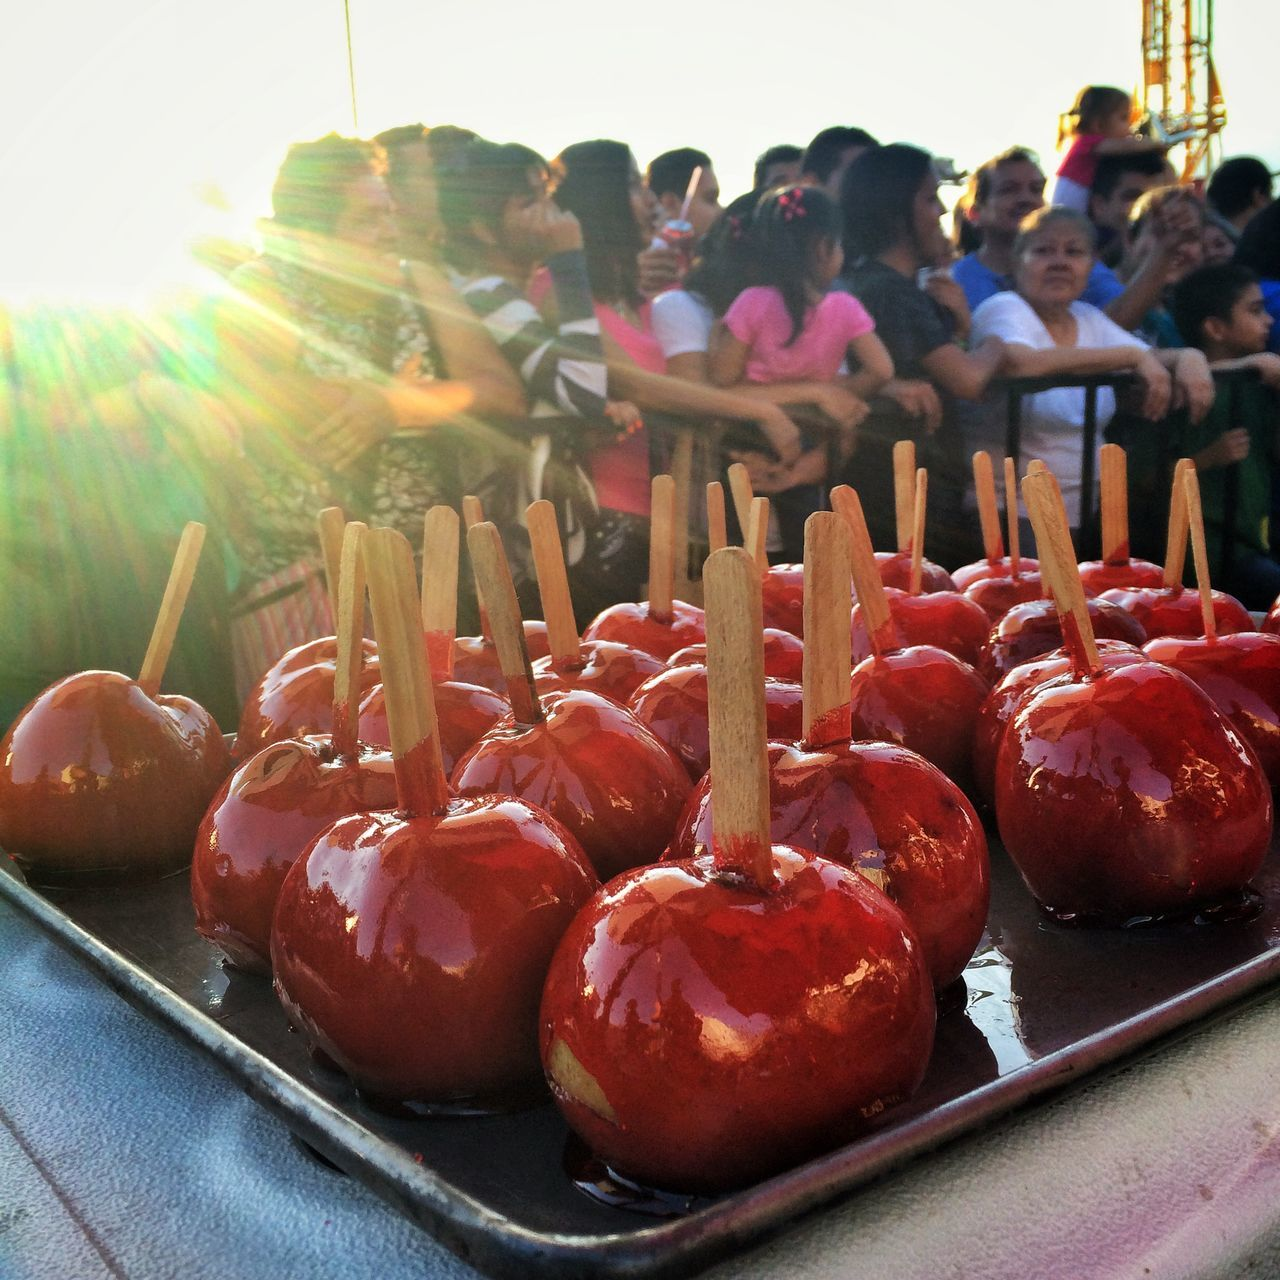 Glitch Caramel Apples State Fair Amusement  Vacation Time Sweets Childhood Memories Candy IPhoneography Photojournalism #CandyApples at the #countryfair. #Salvadorans are enjoying the holydays in honor to the Divine #SavioroftheWorld #JesusChrist. / #Manzanas en miel o con #caramelo en la feria. Los #salvadoreños están disfrutando de los días festivos en honor a la Divino